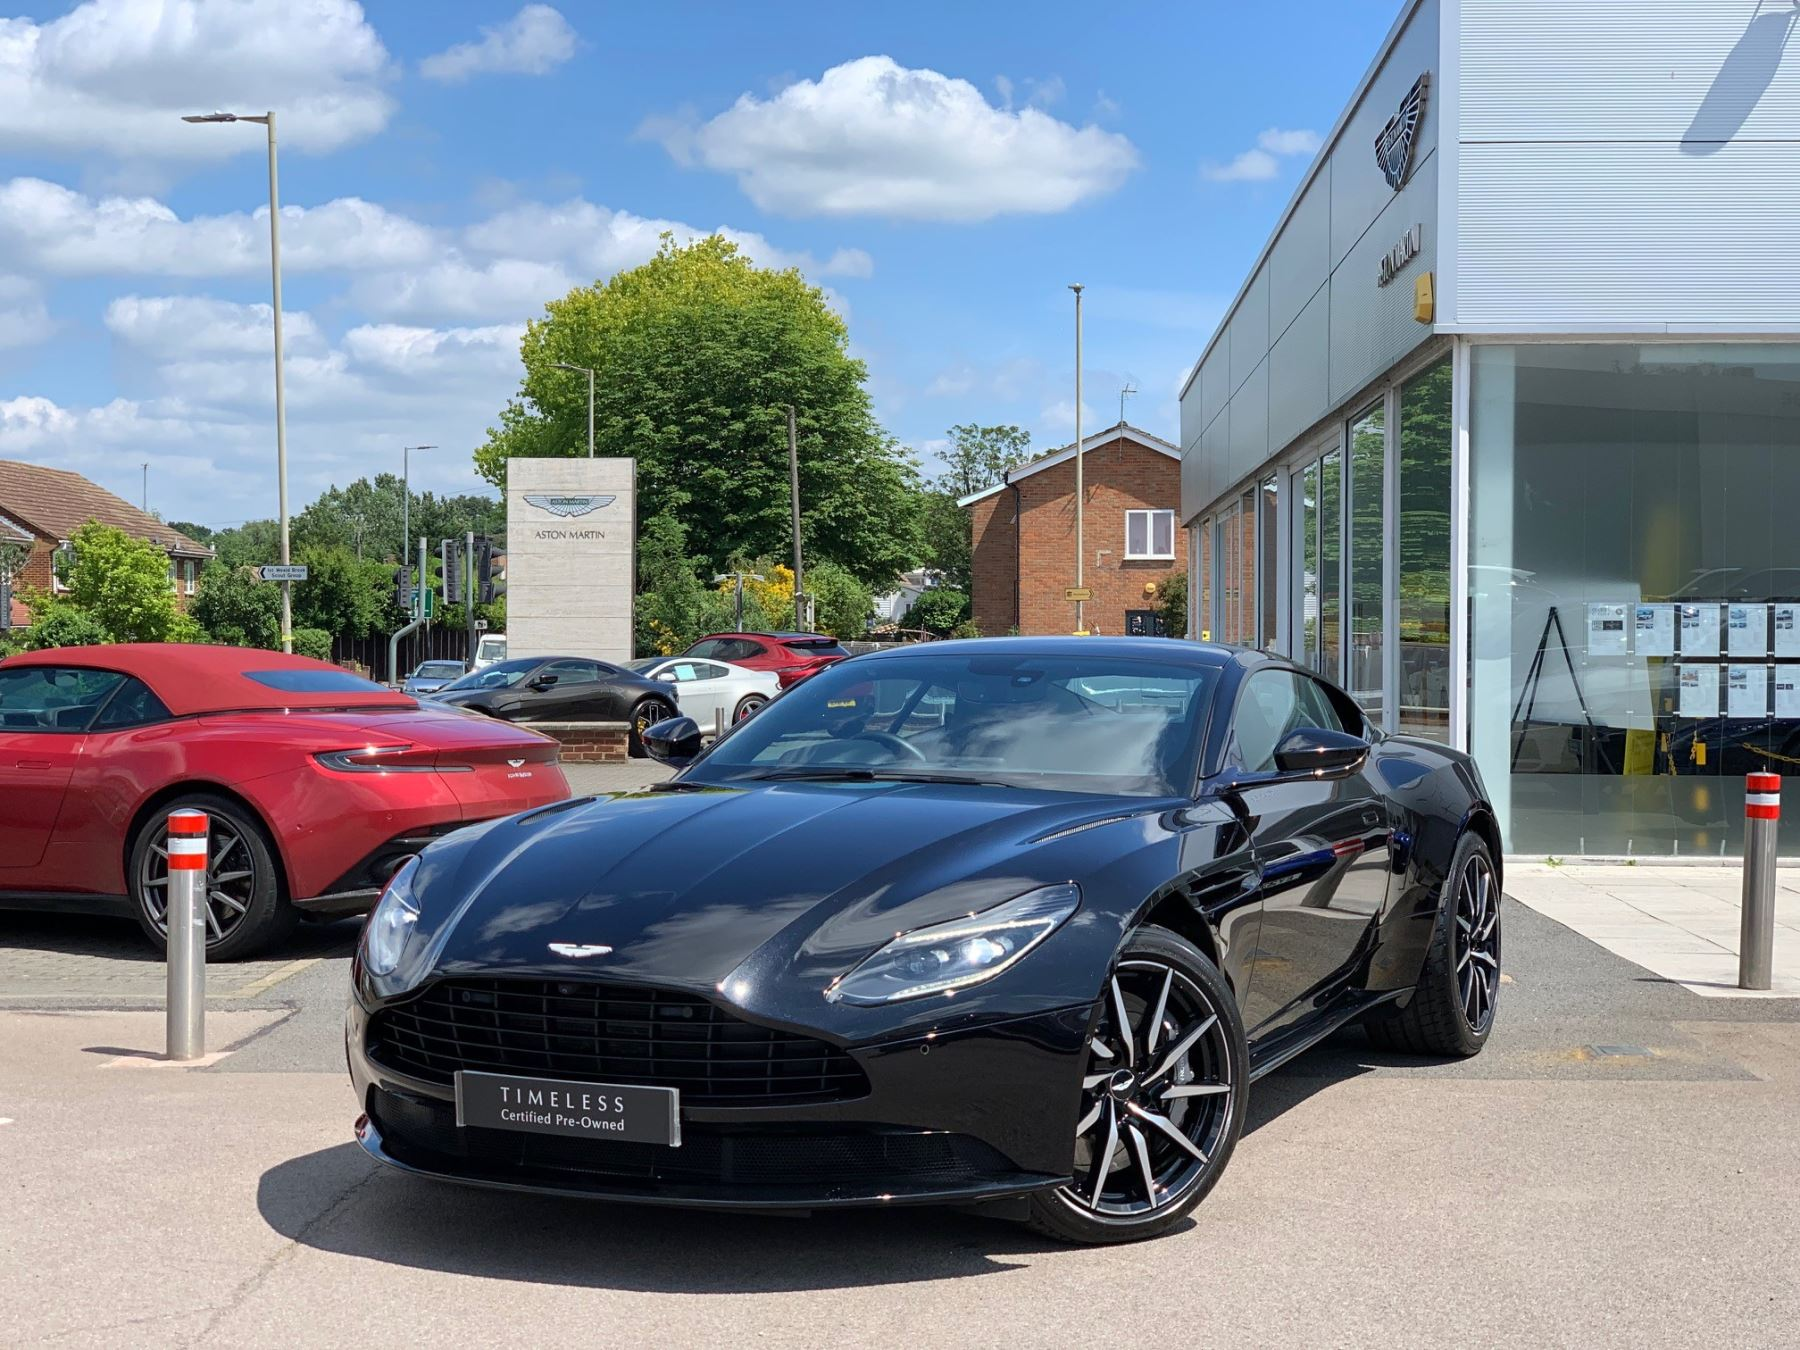 Automatic Aston Martin DB11